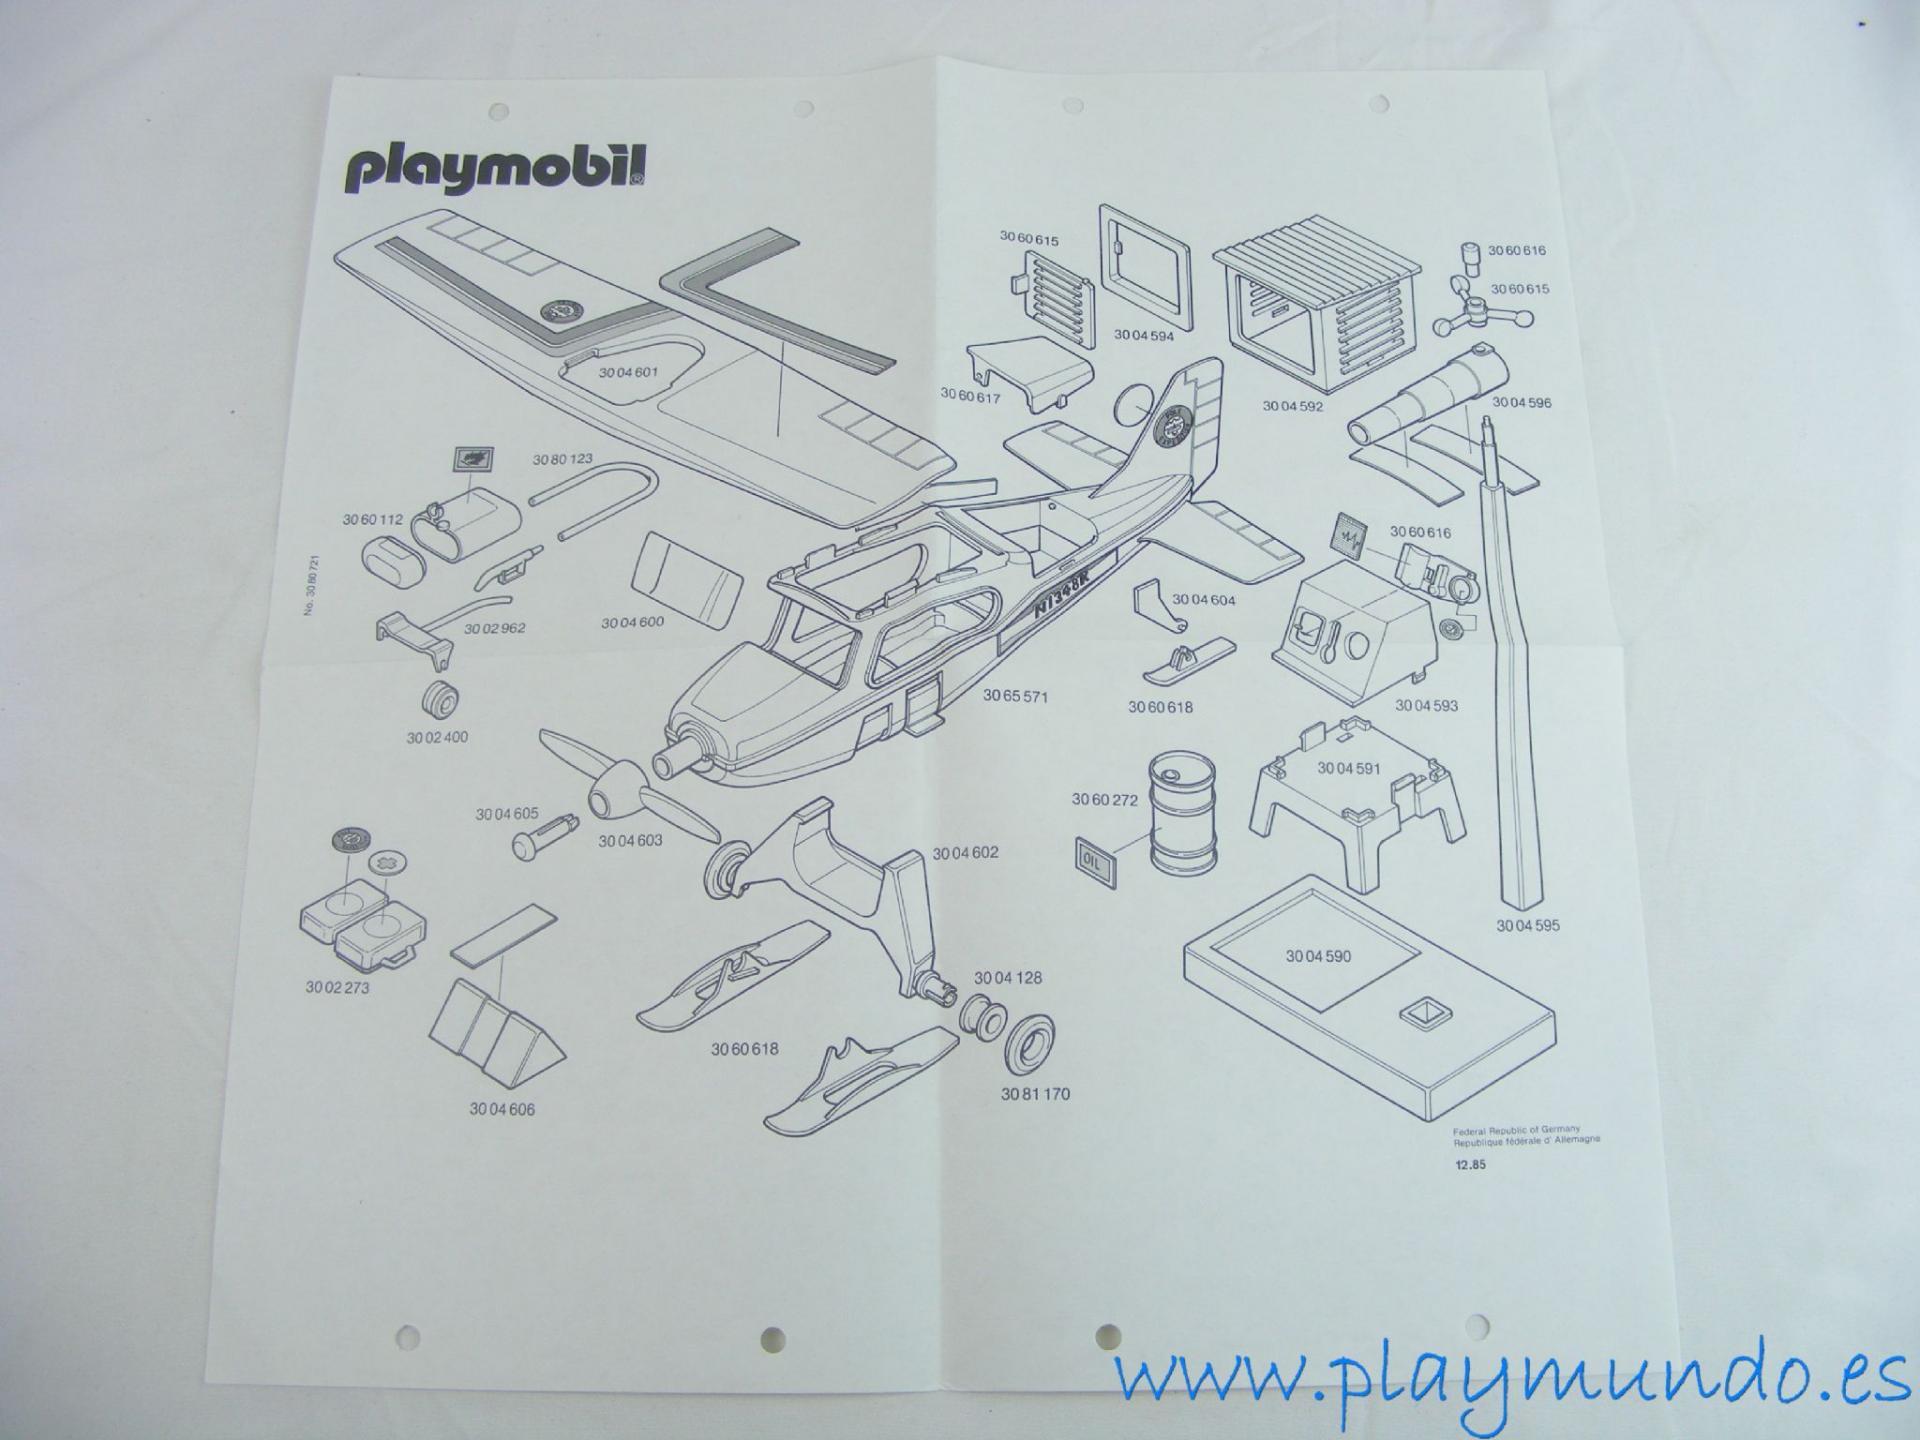 PLAYMOBIL MANUAL AVIONETA EXPEDICION POLAR 3457